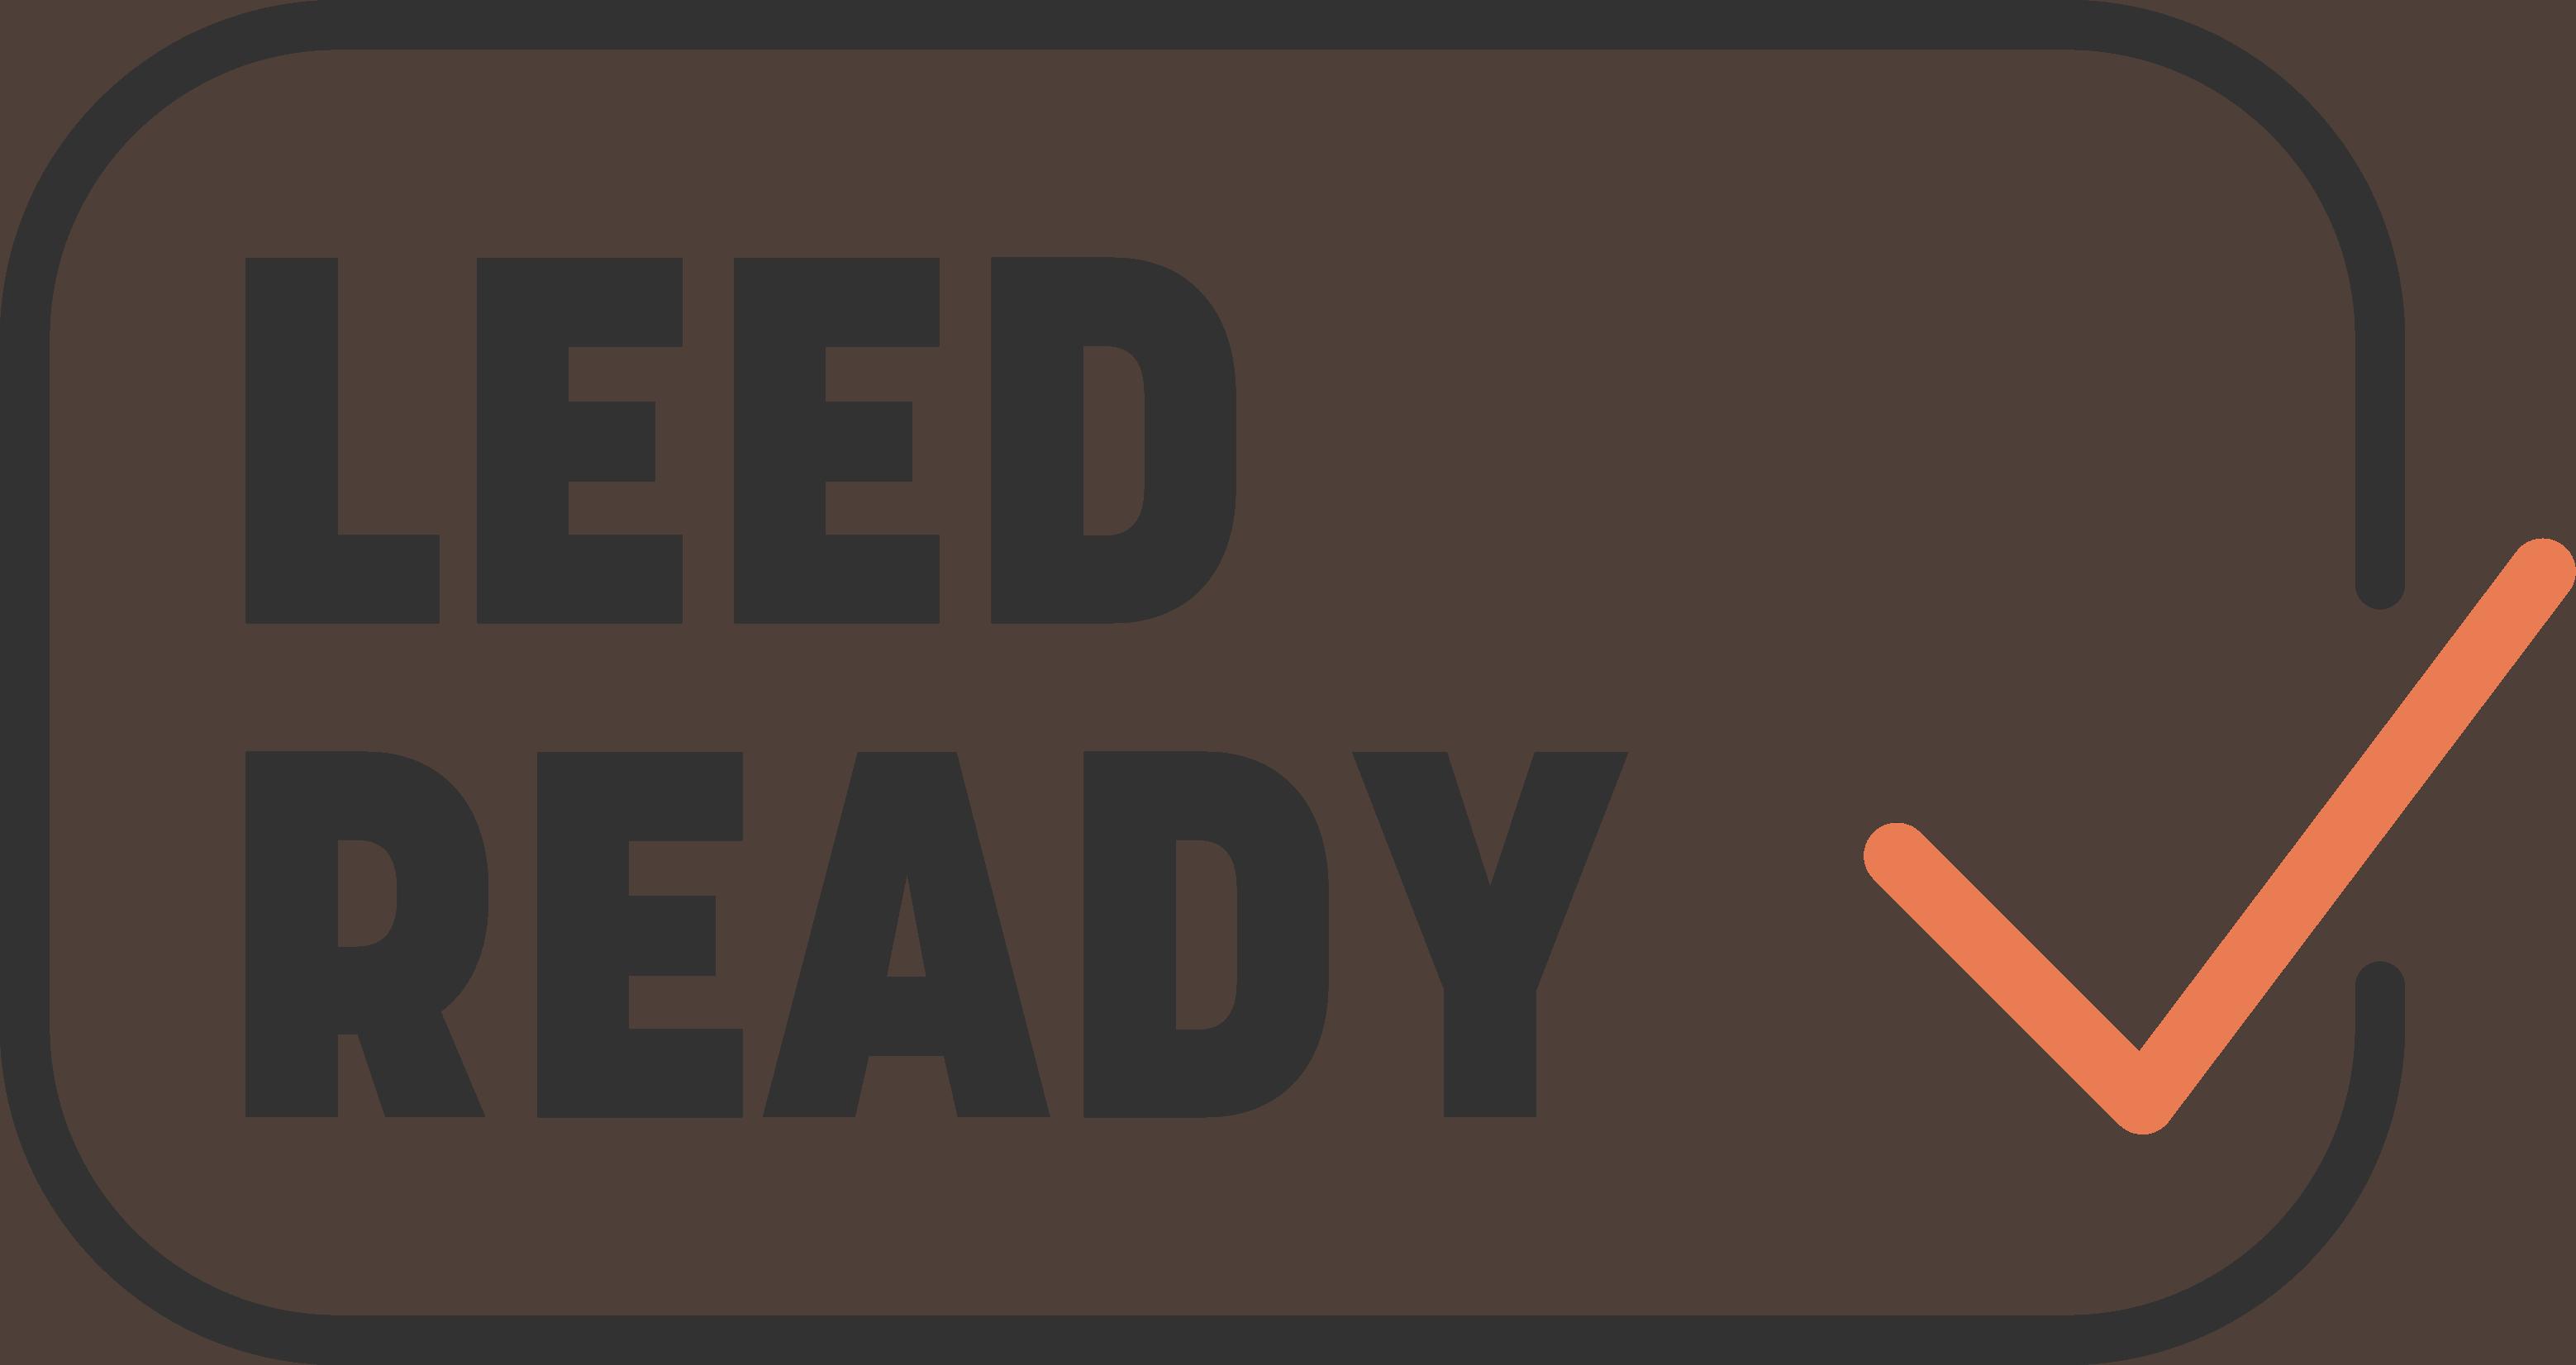 LEED Ready